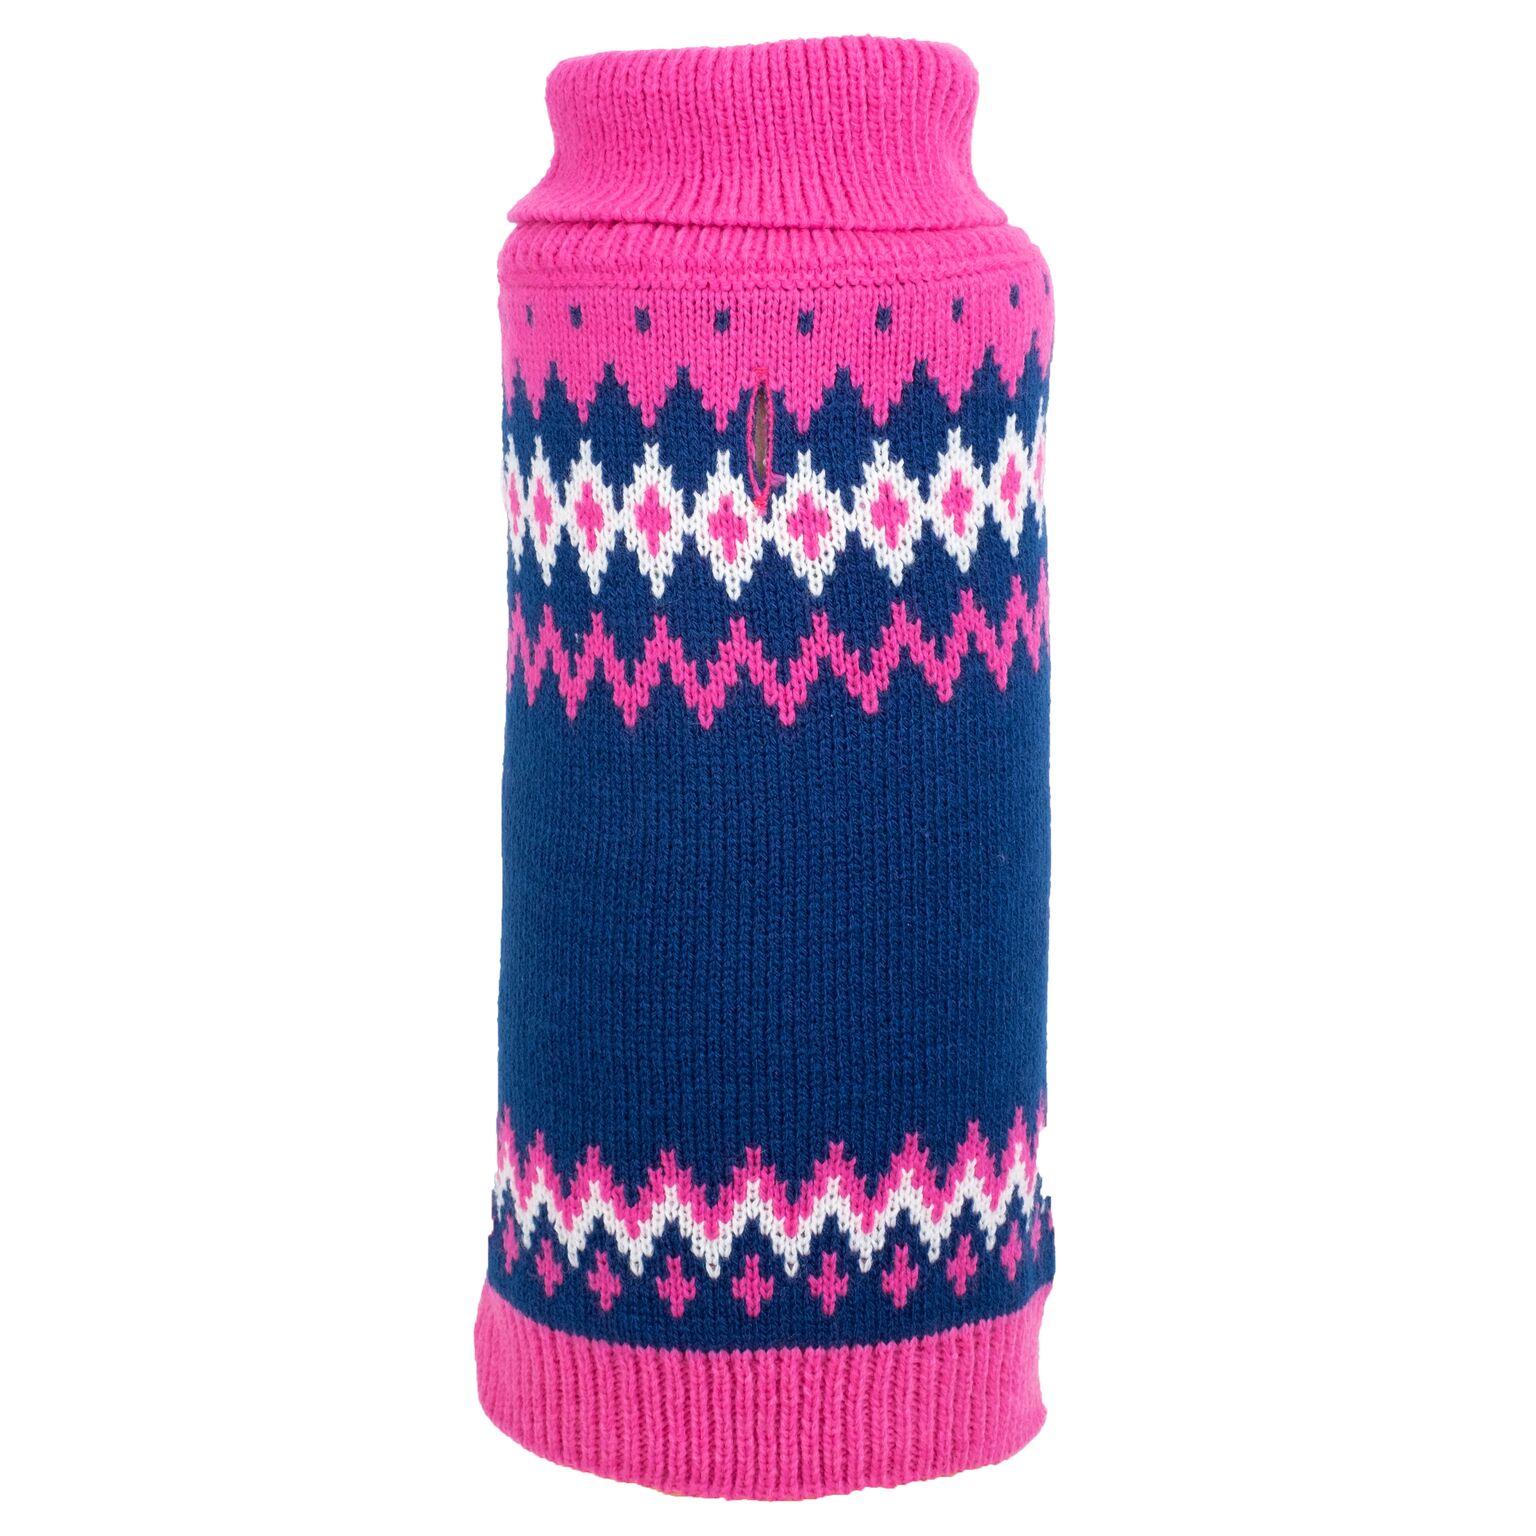 The Worthy Dog Sweater, Fairisle Pink, X-Large